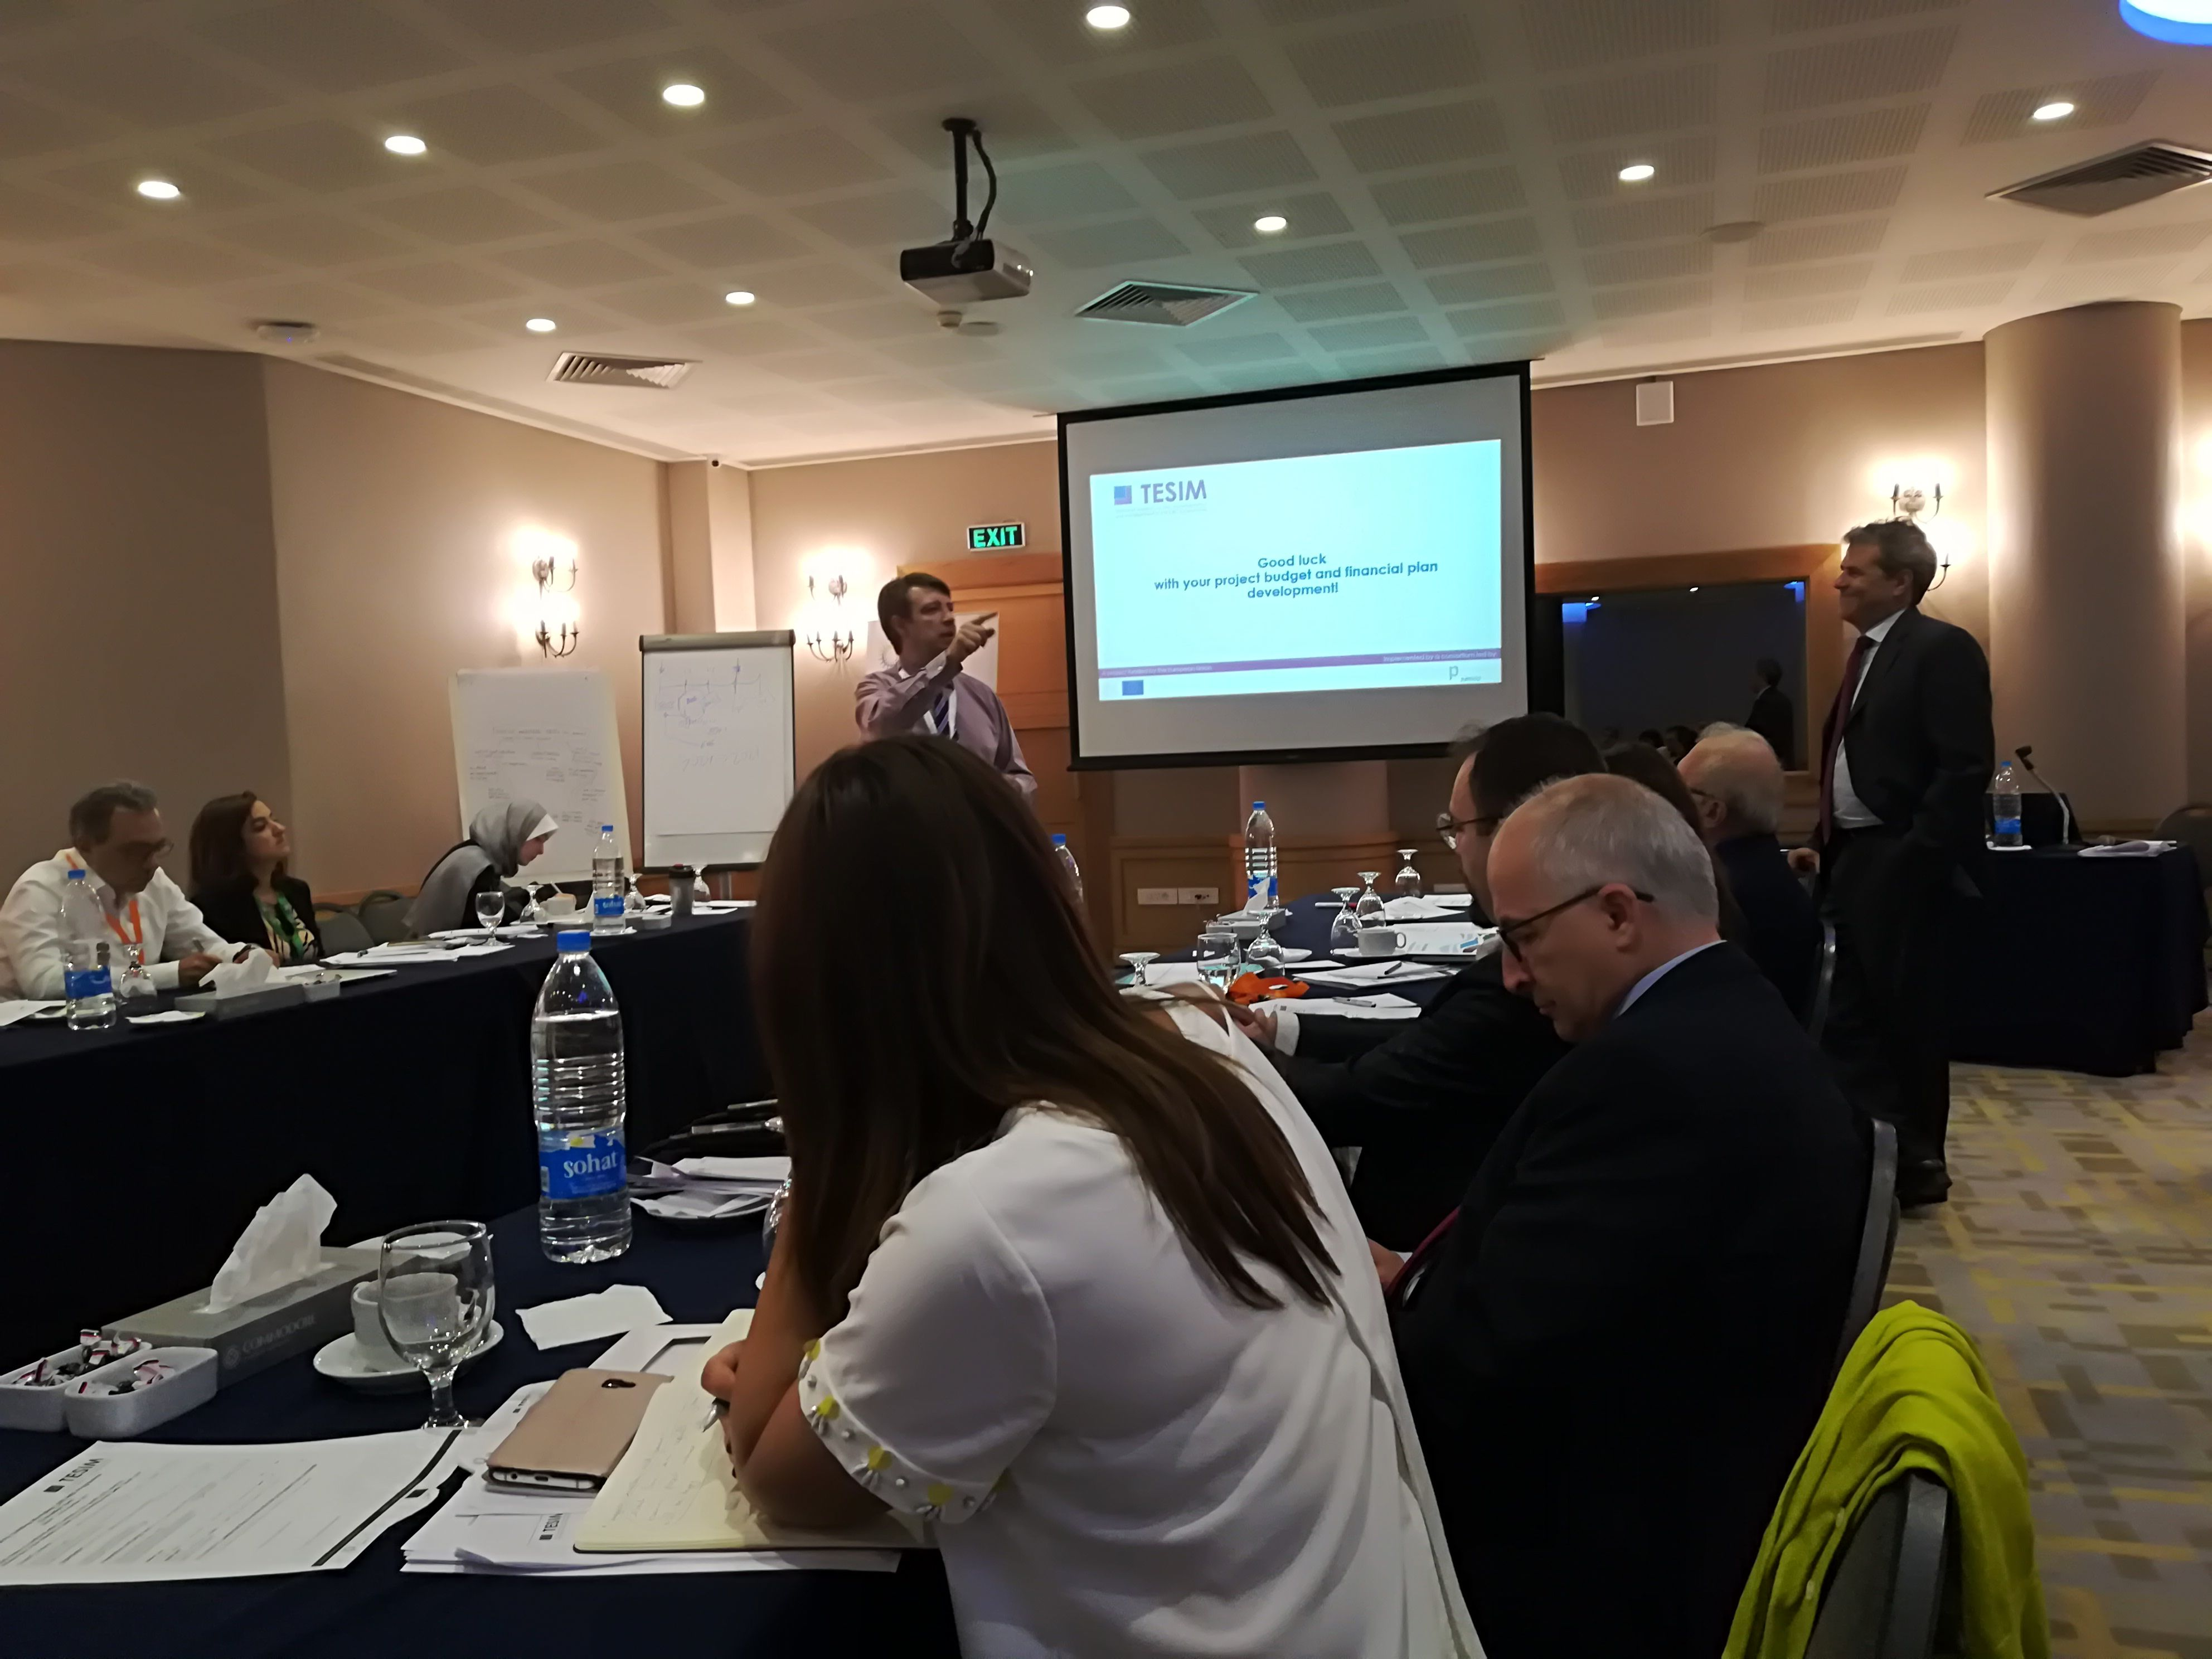 Ateliers de renforcement des capacités, Programme IEV CT Italie Tunisie 2014-2020 : Tunis